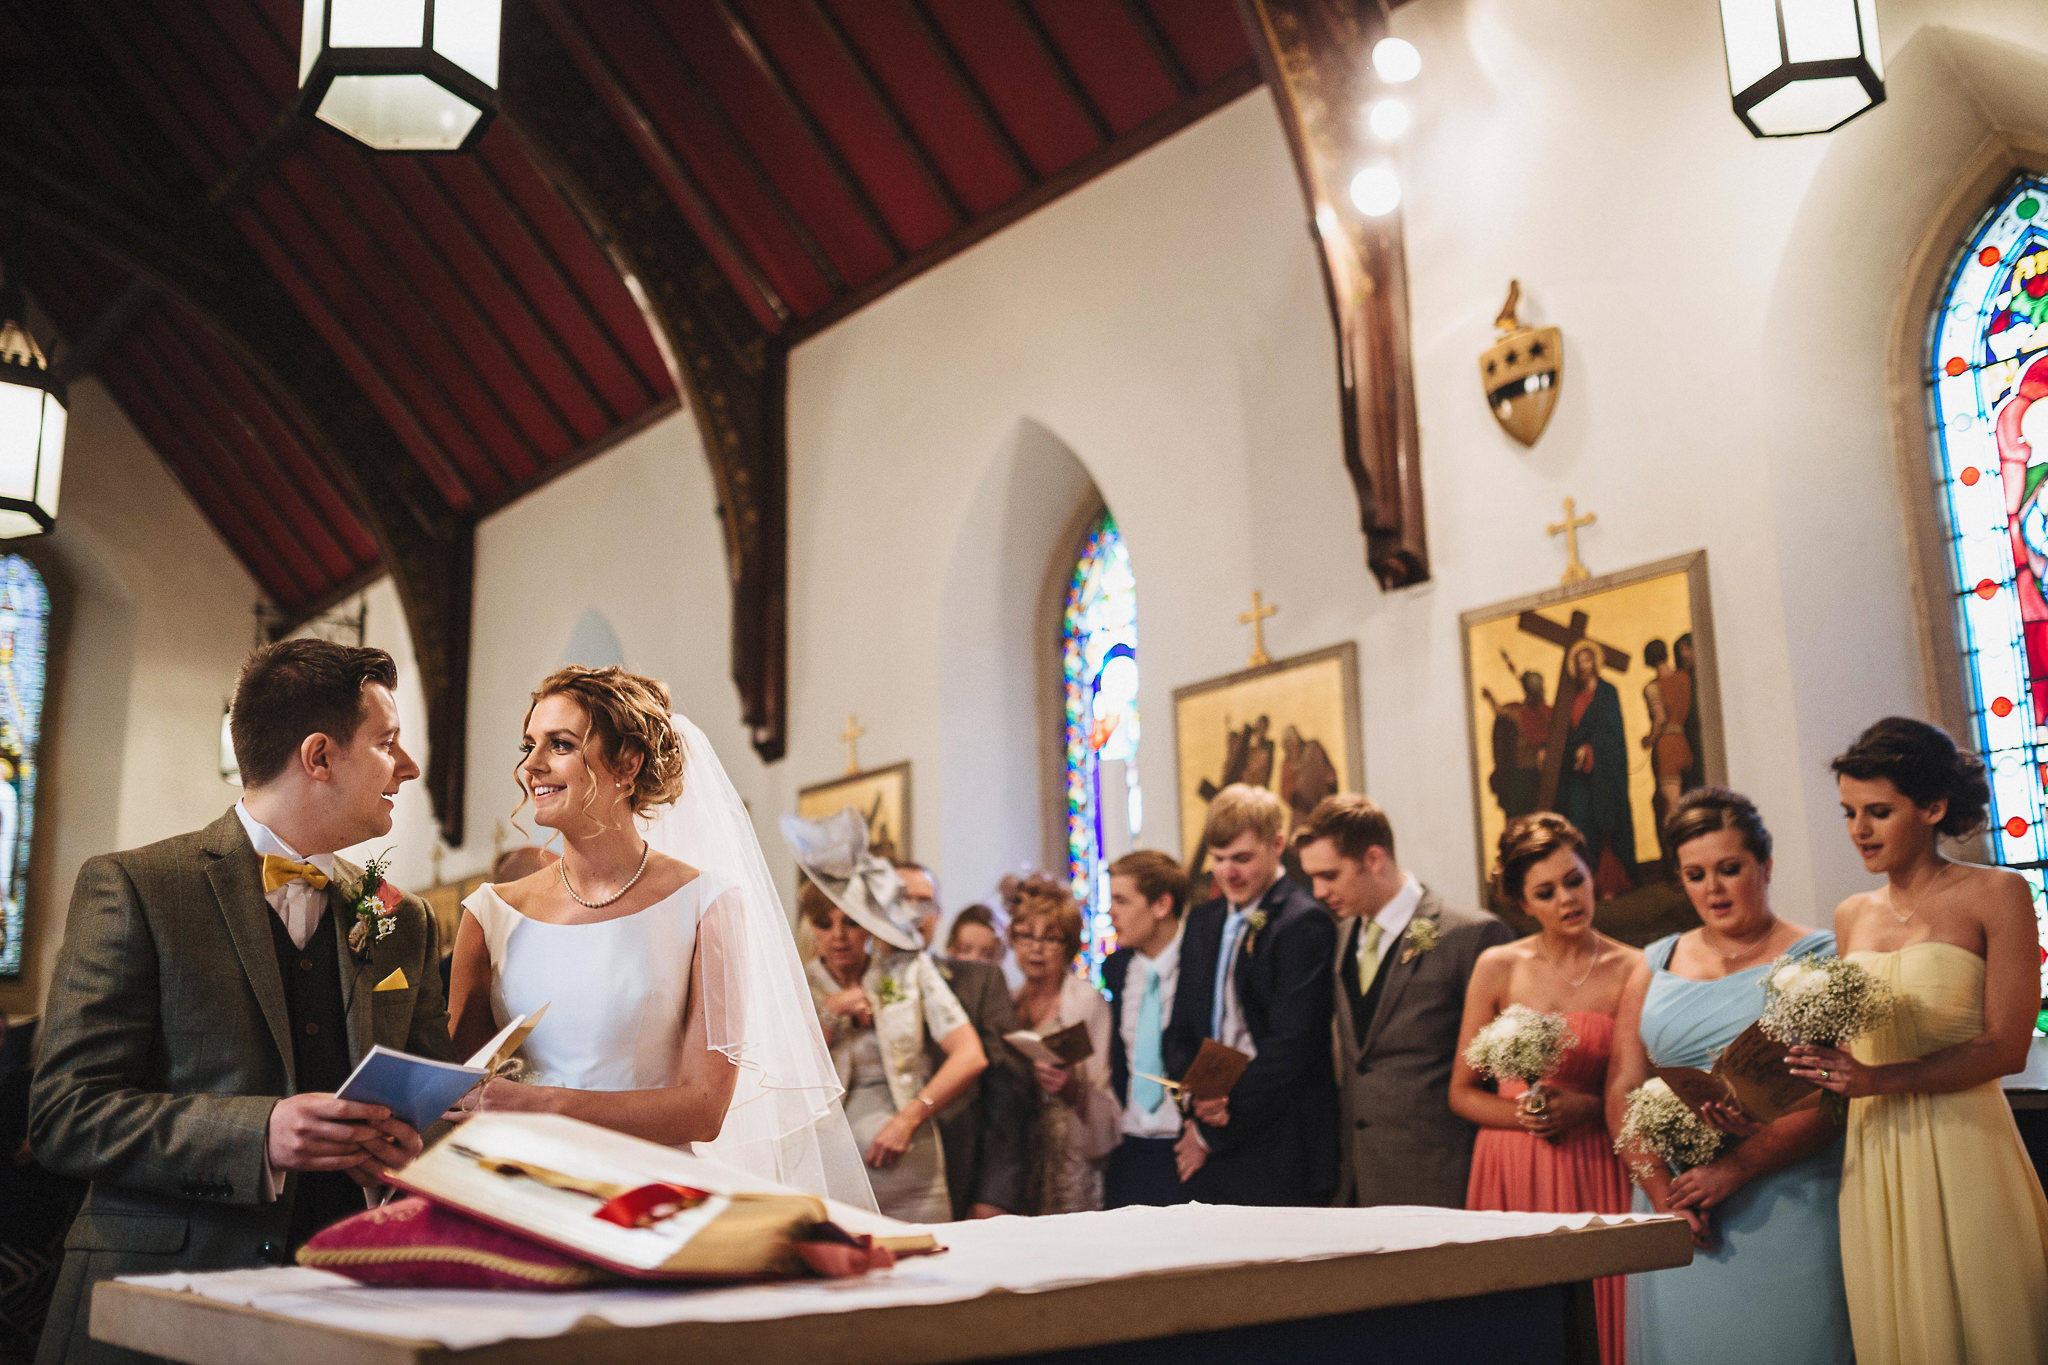 Lancashire-Creative-natural-documentary-wedding-photography-90030